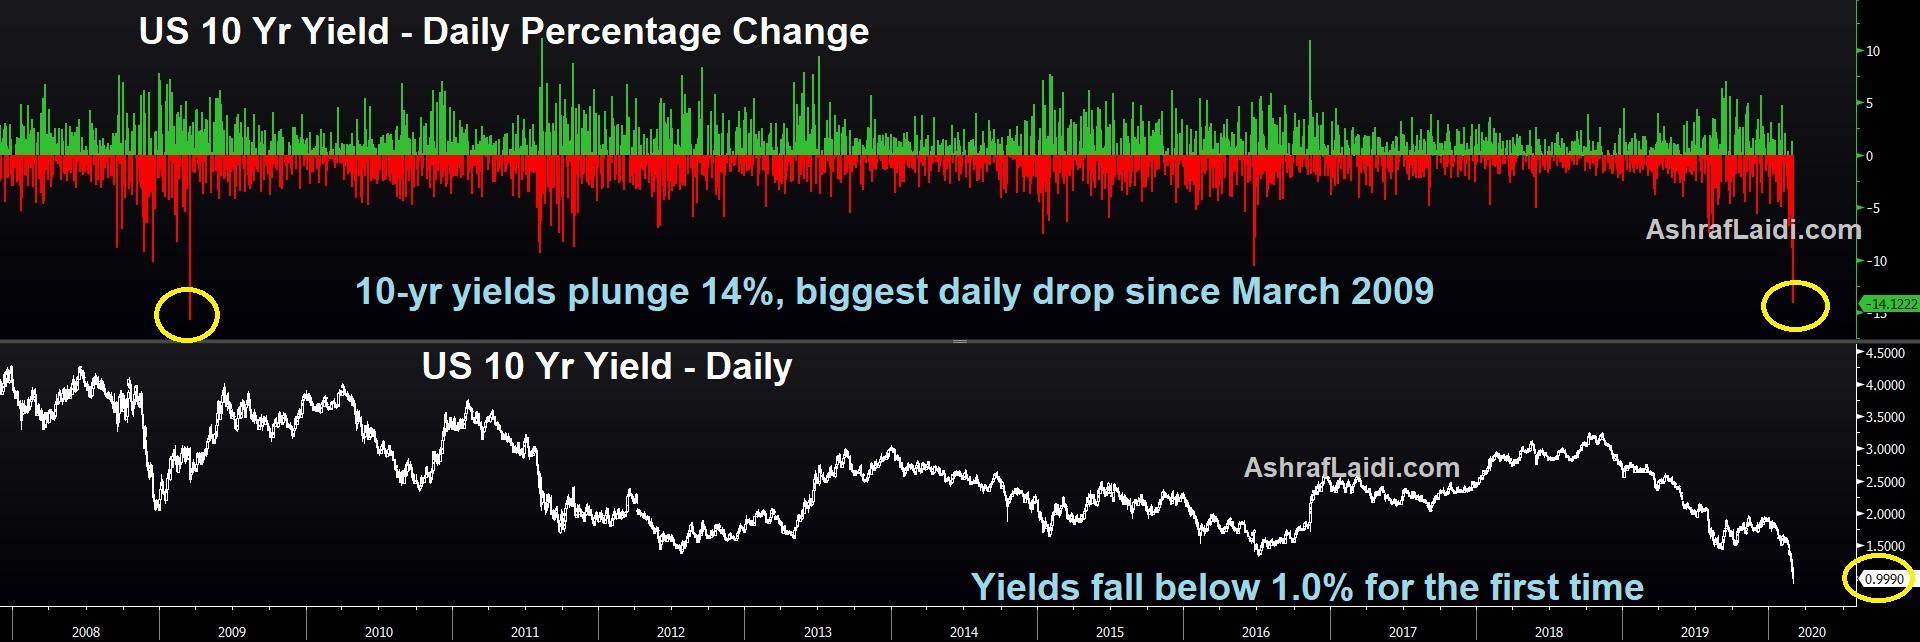 US 10 Yr Yield Daily Percentage Change